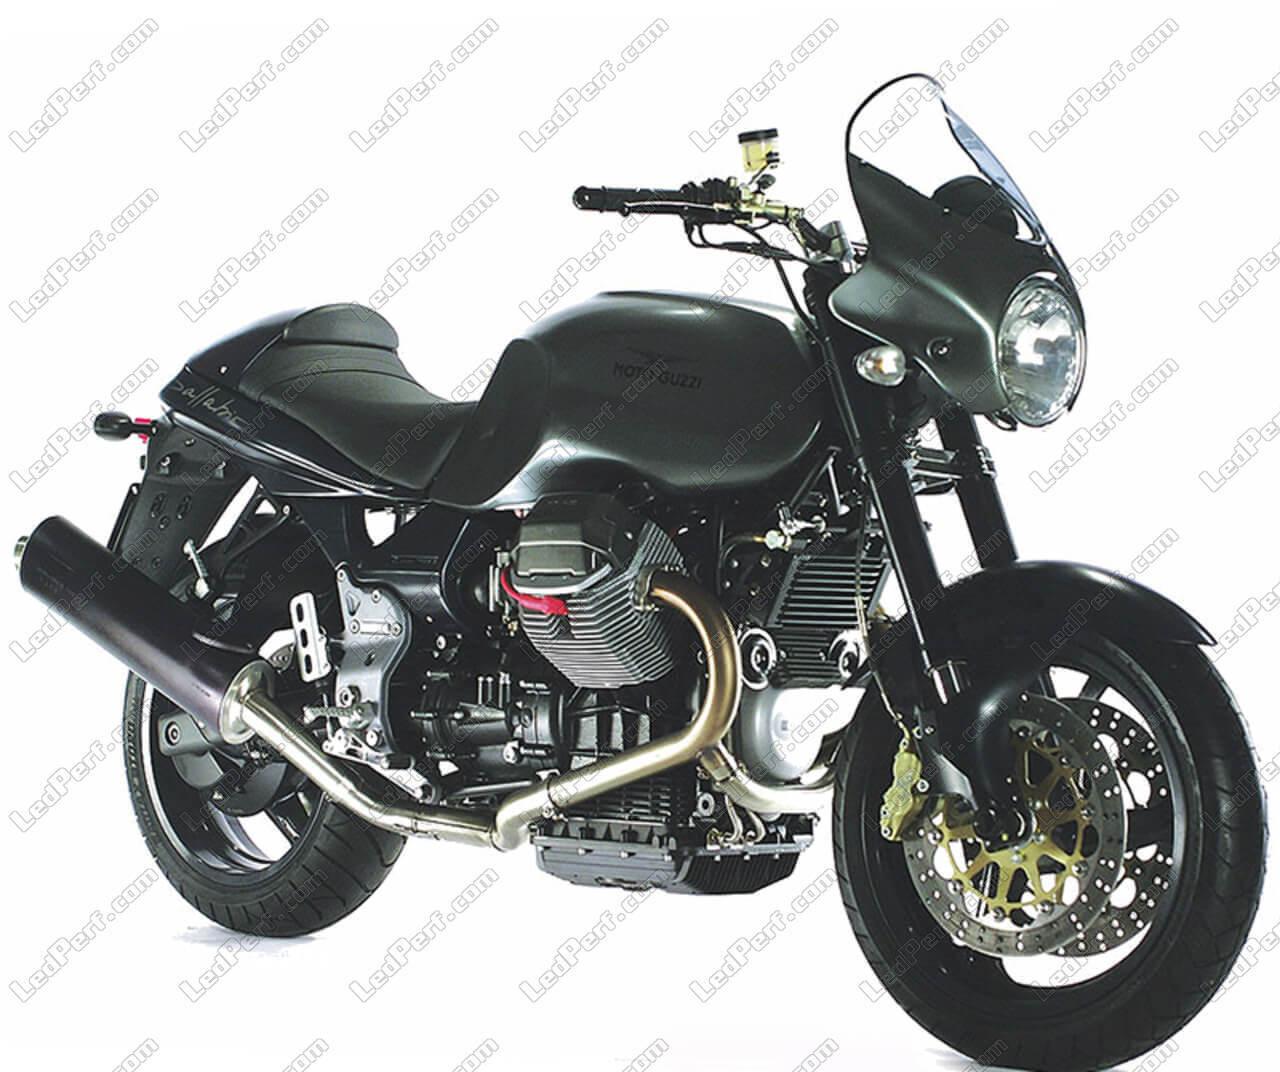 phares additionnels led pour moto moto guzzi v 11 sport ballabio. Black Bedroom Furniture Sets. Home Design Ideas